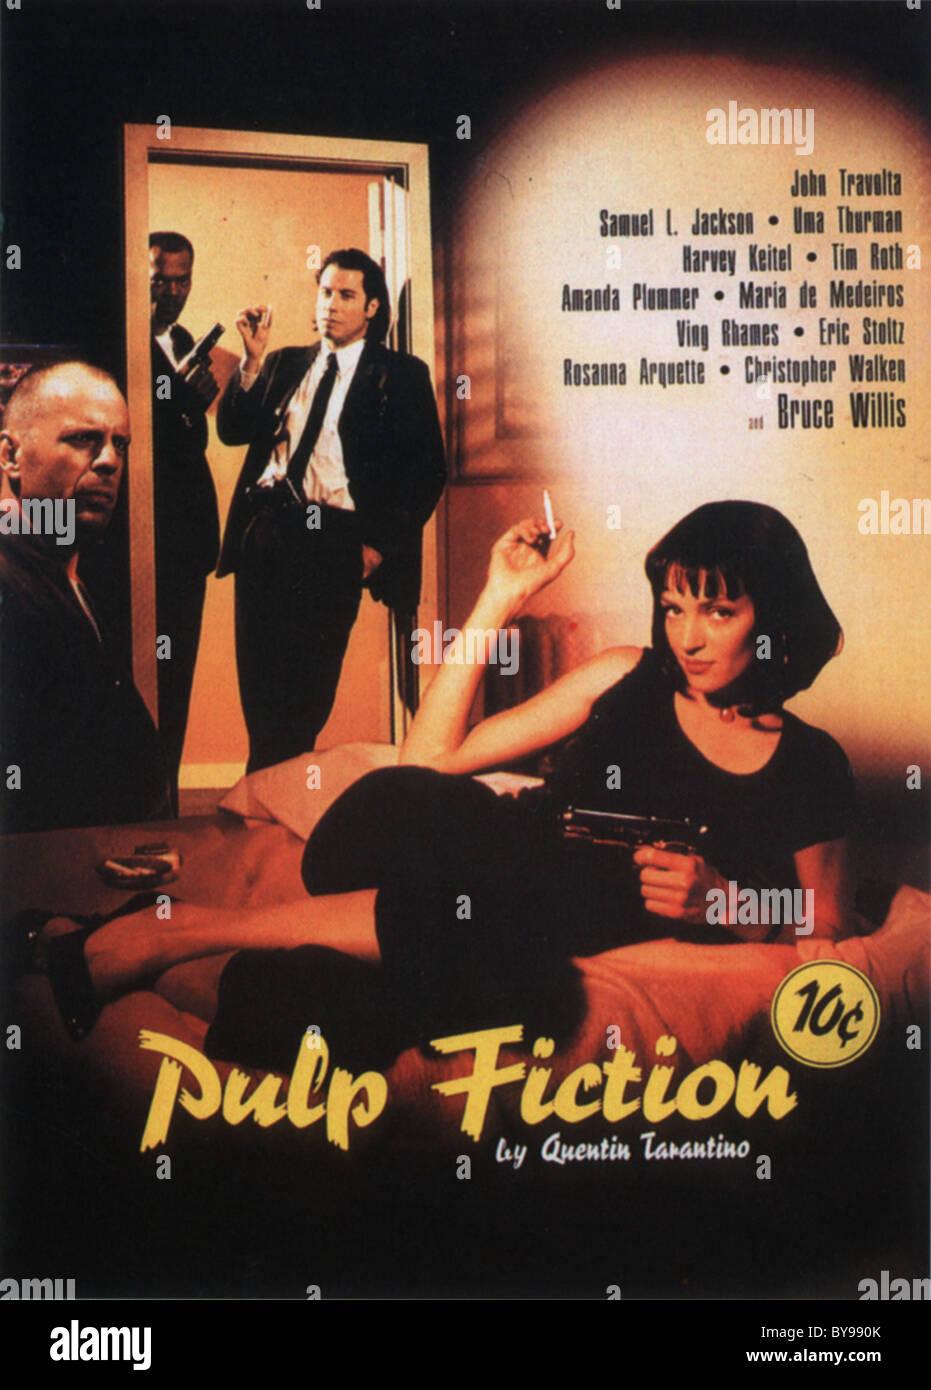 Pulp Fiction Jahr: 1994 - USA Regie: Quentin Tarantino Uma Thurman Filmplakat (USA) Goldene Palme Cannes 1994 Stockbild